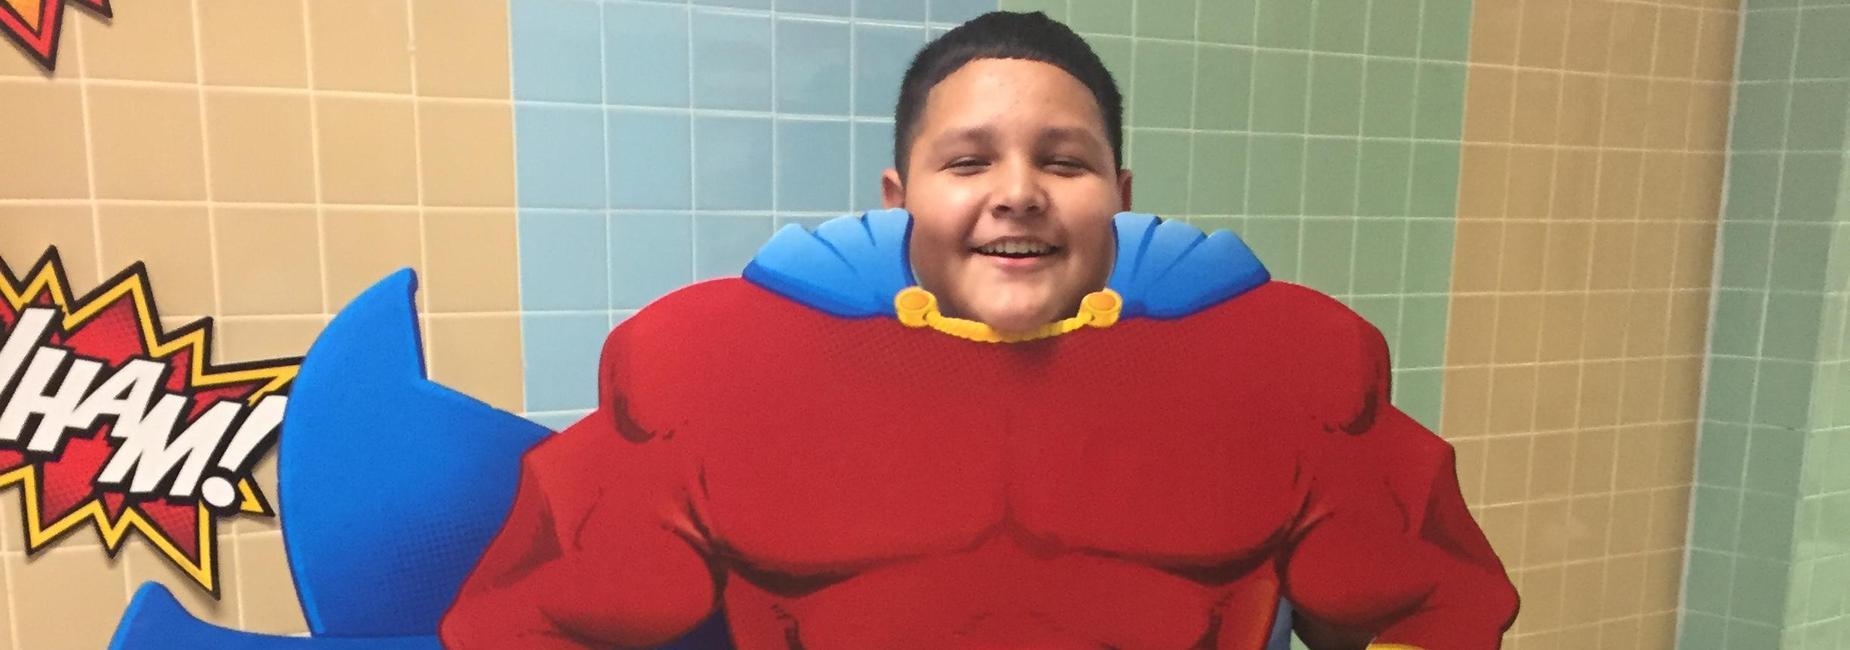 Student posing with superhero cutout .  Estudiante posando con recorte de superhéroe